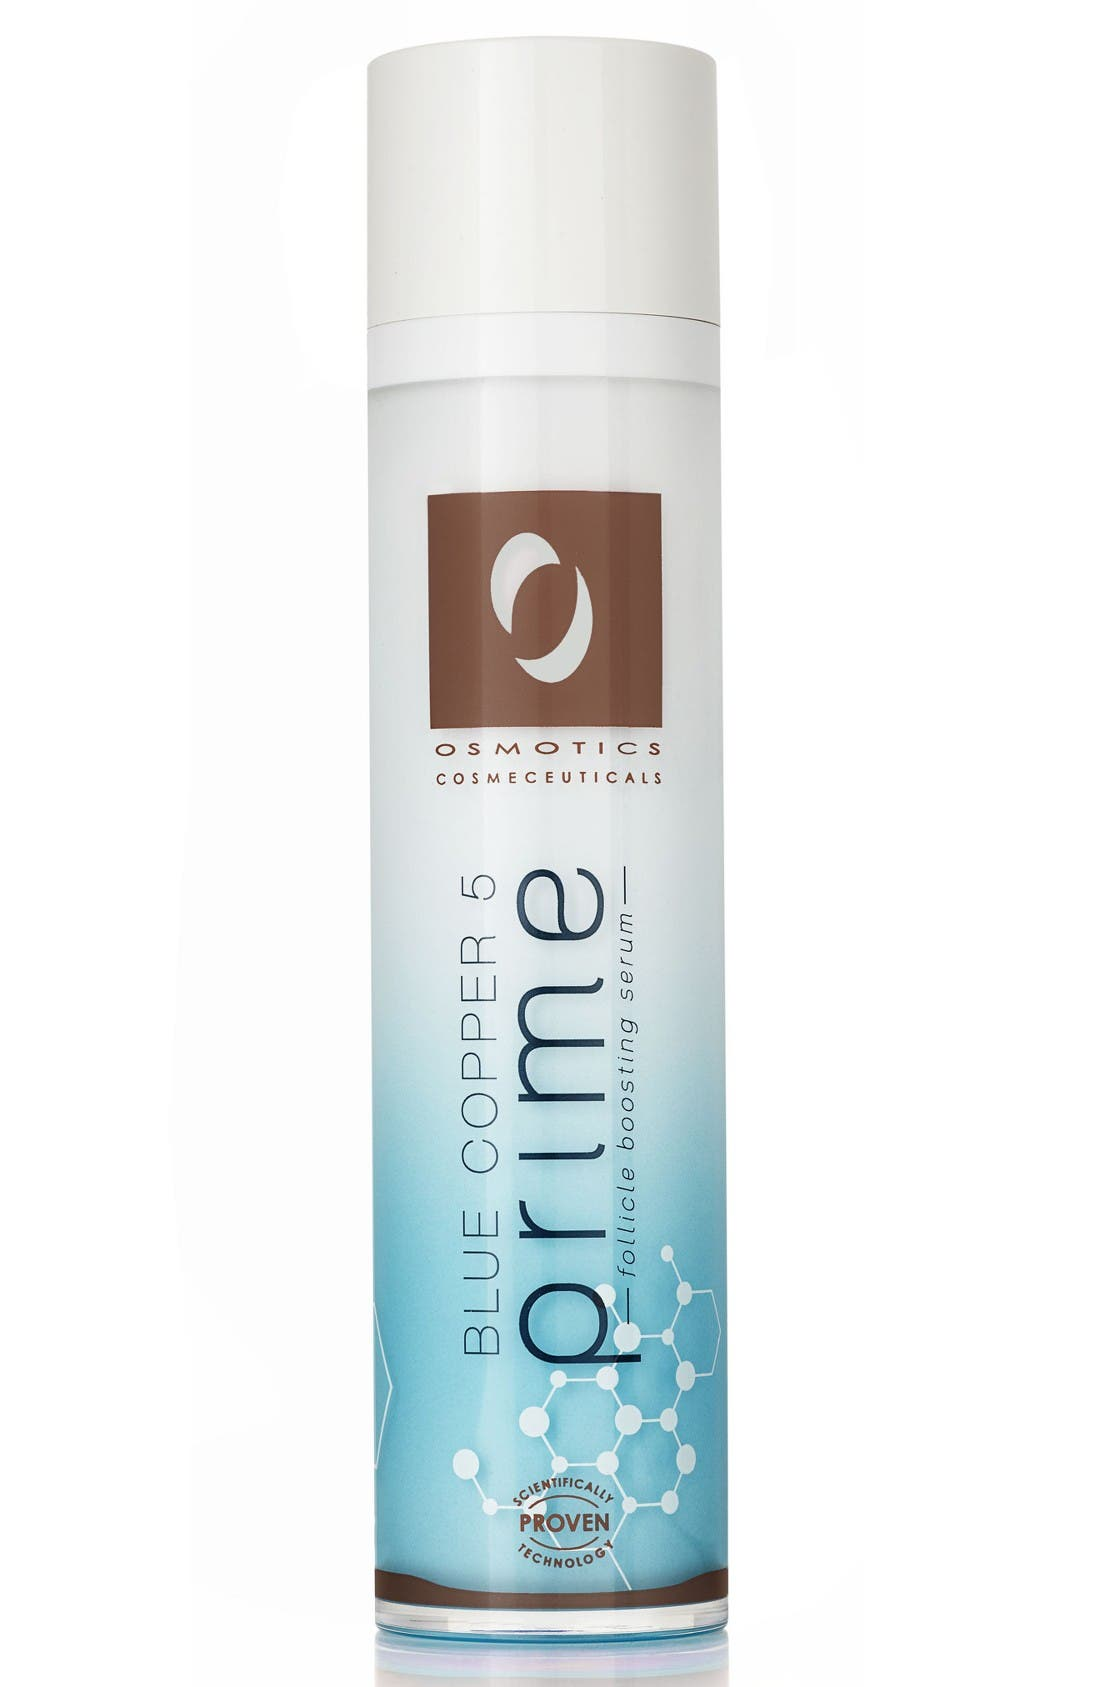 Osmotics Cosmeceuticals Blue Copper 5 Prime Follicle Boosting Serum